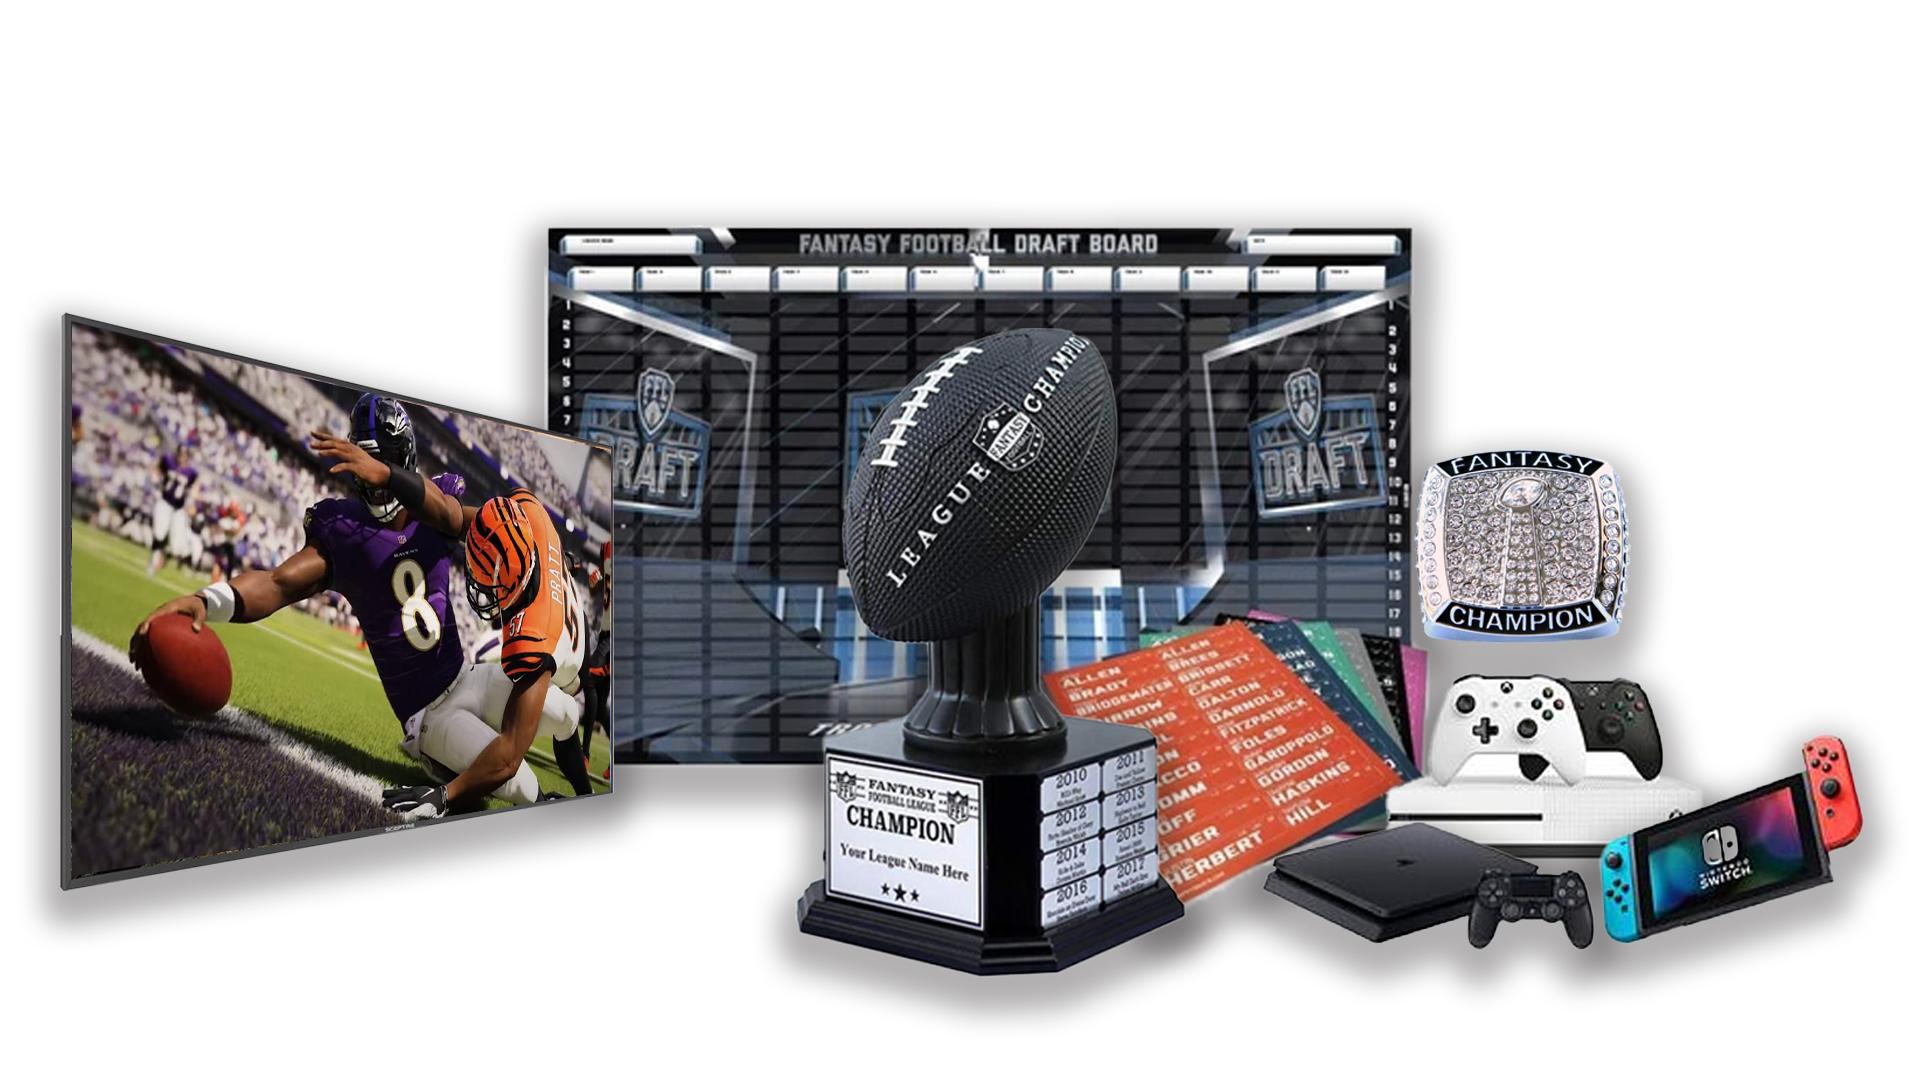 - FFDraft Trophy Black - Fantasy Football Draft Parties at 1Life2Play